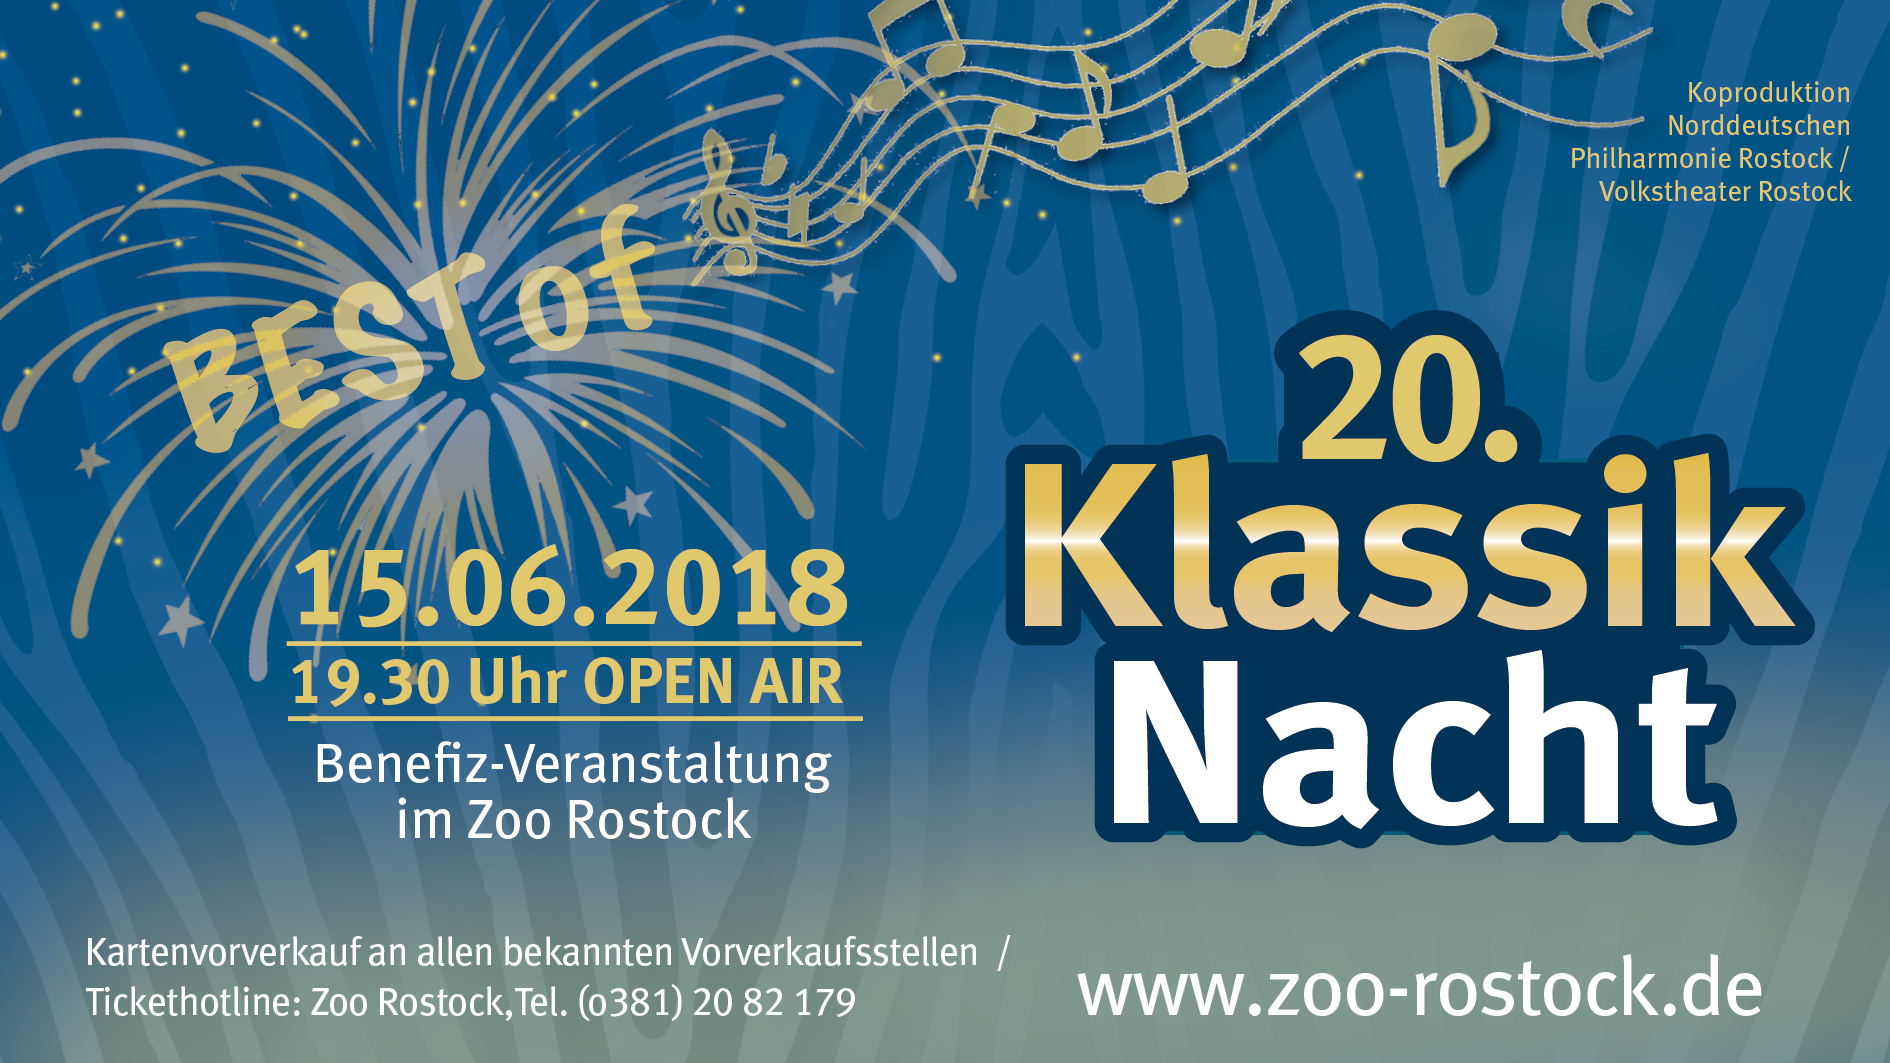 20. Klassik-Nacht im Zoo Rostock